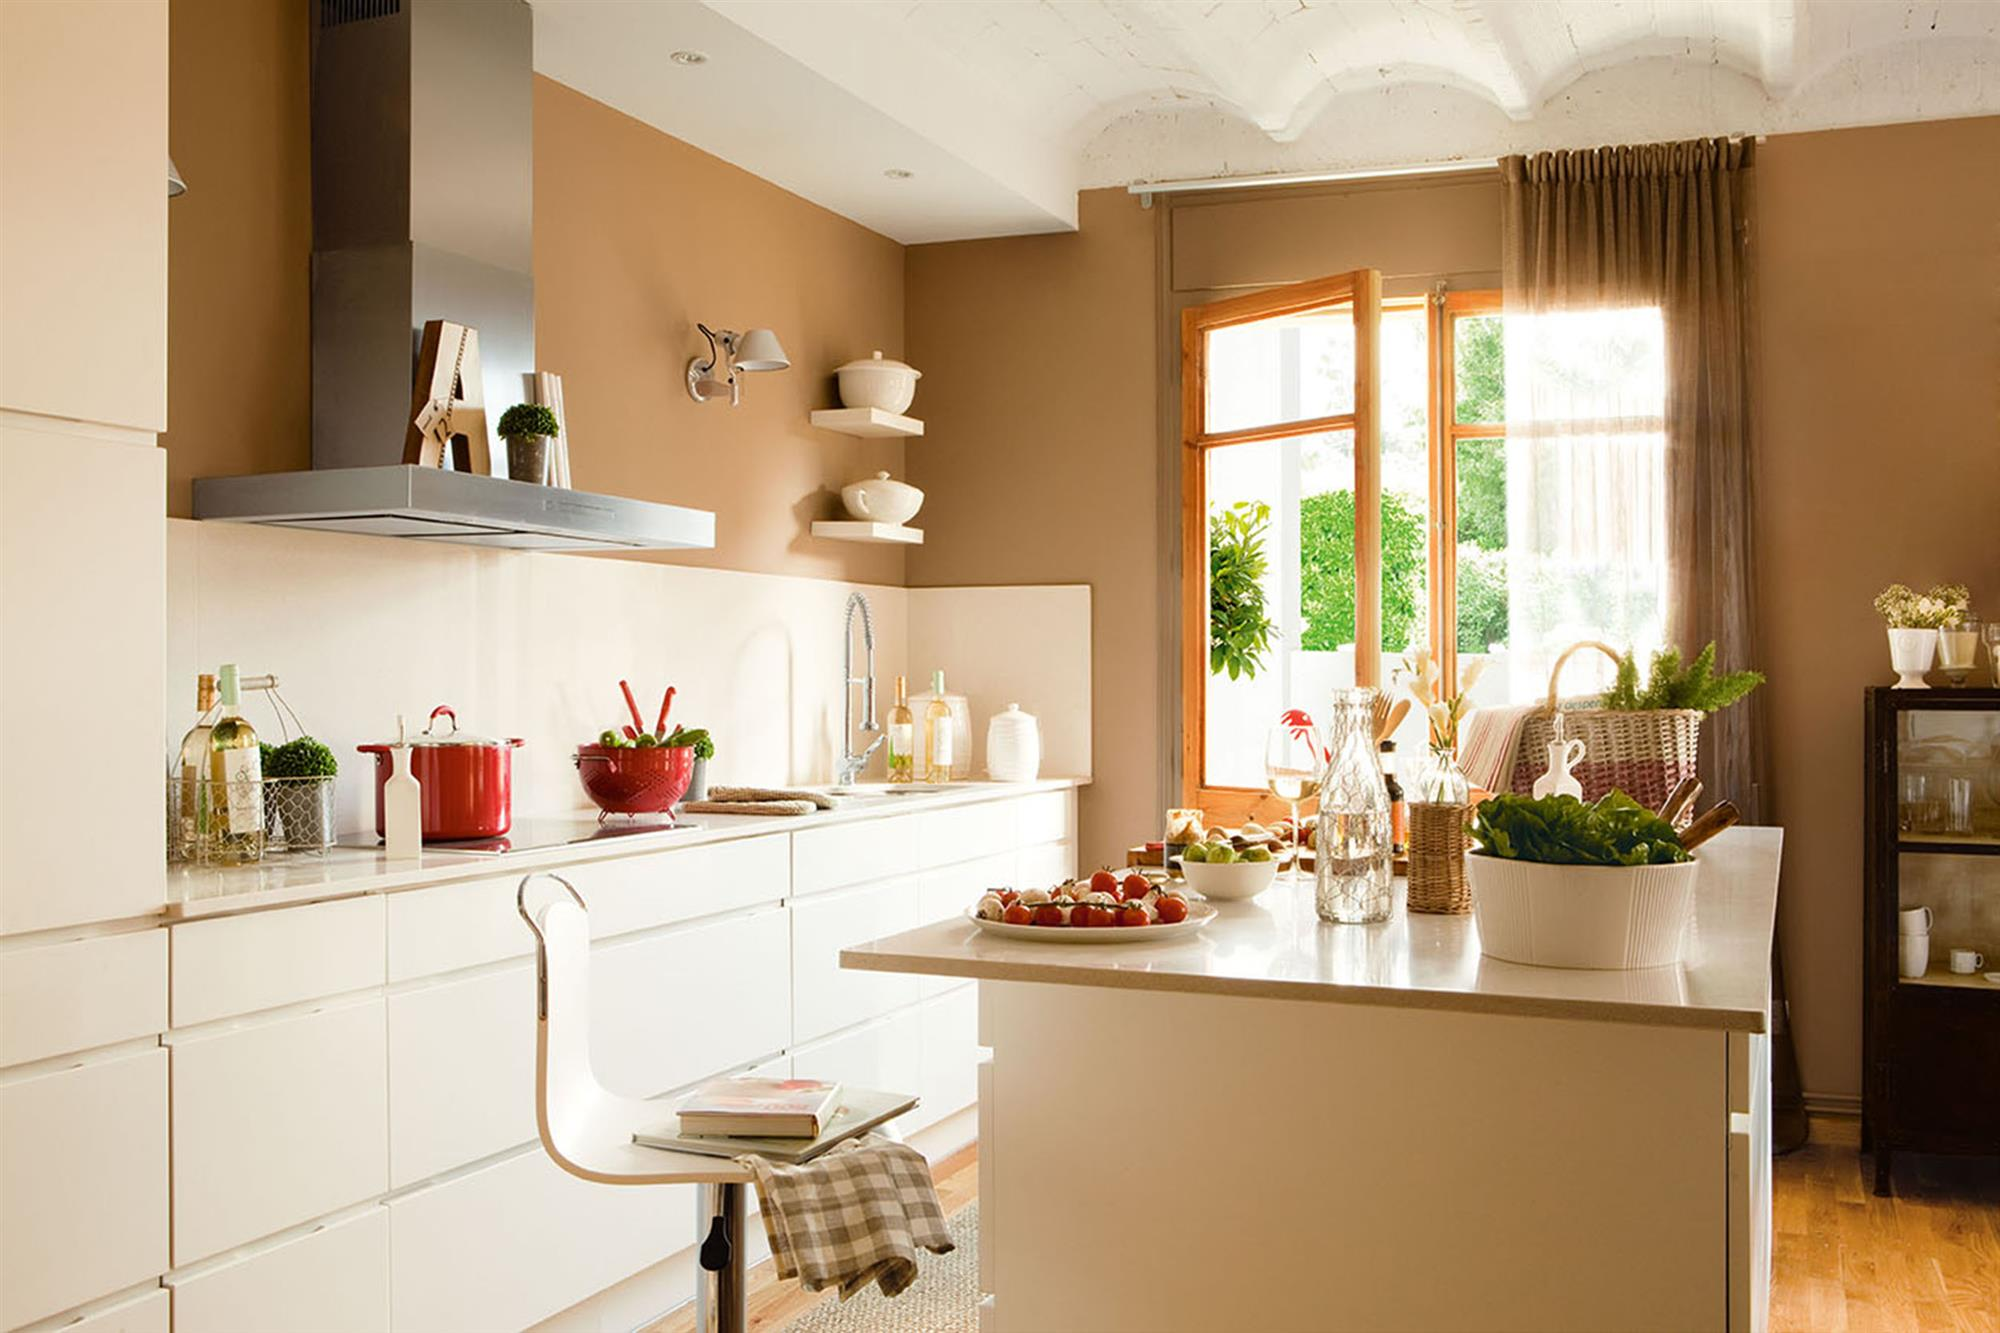 Красивая бежевая кухня фото в испании